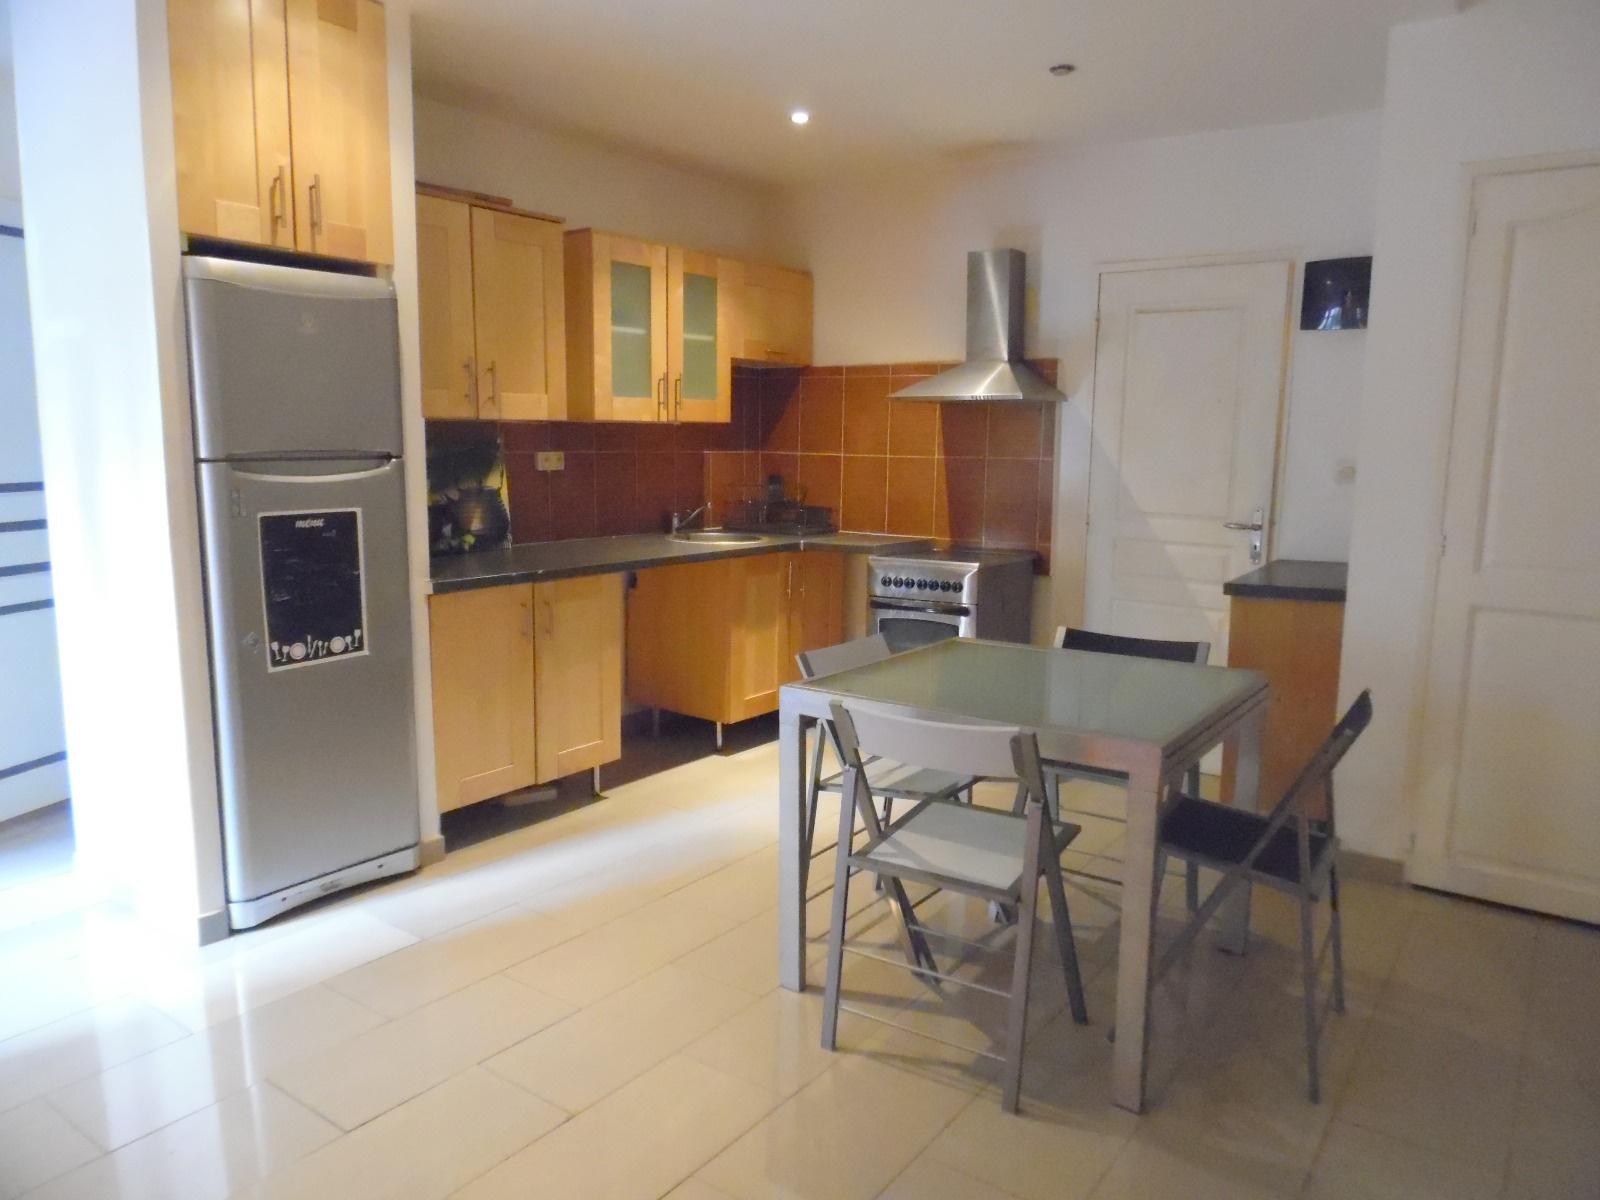 location immobilier nice. Black Bedroom Furniture Sets. Home Design Ideas